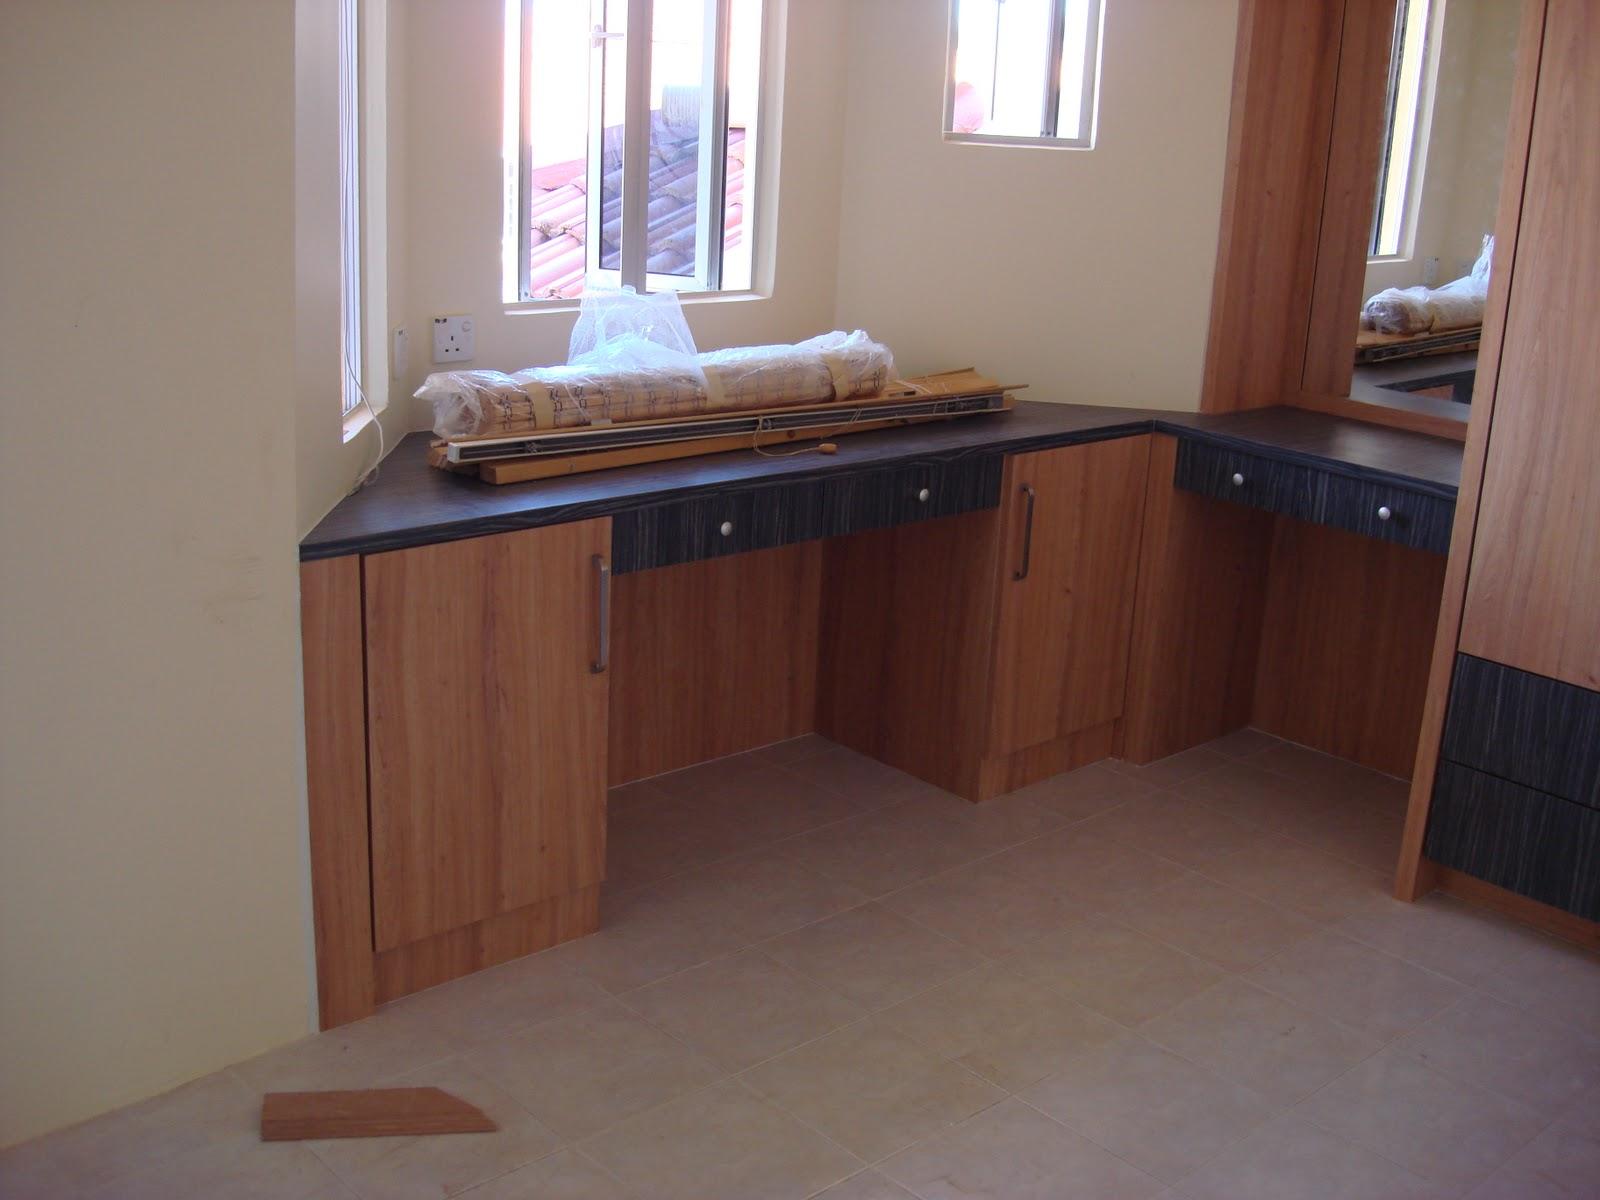 Interior design renovation kuala terengganu kitchen and - Master bedroom study table ...